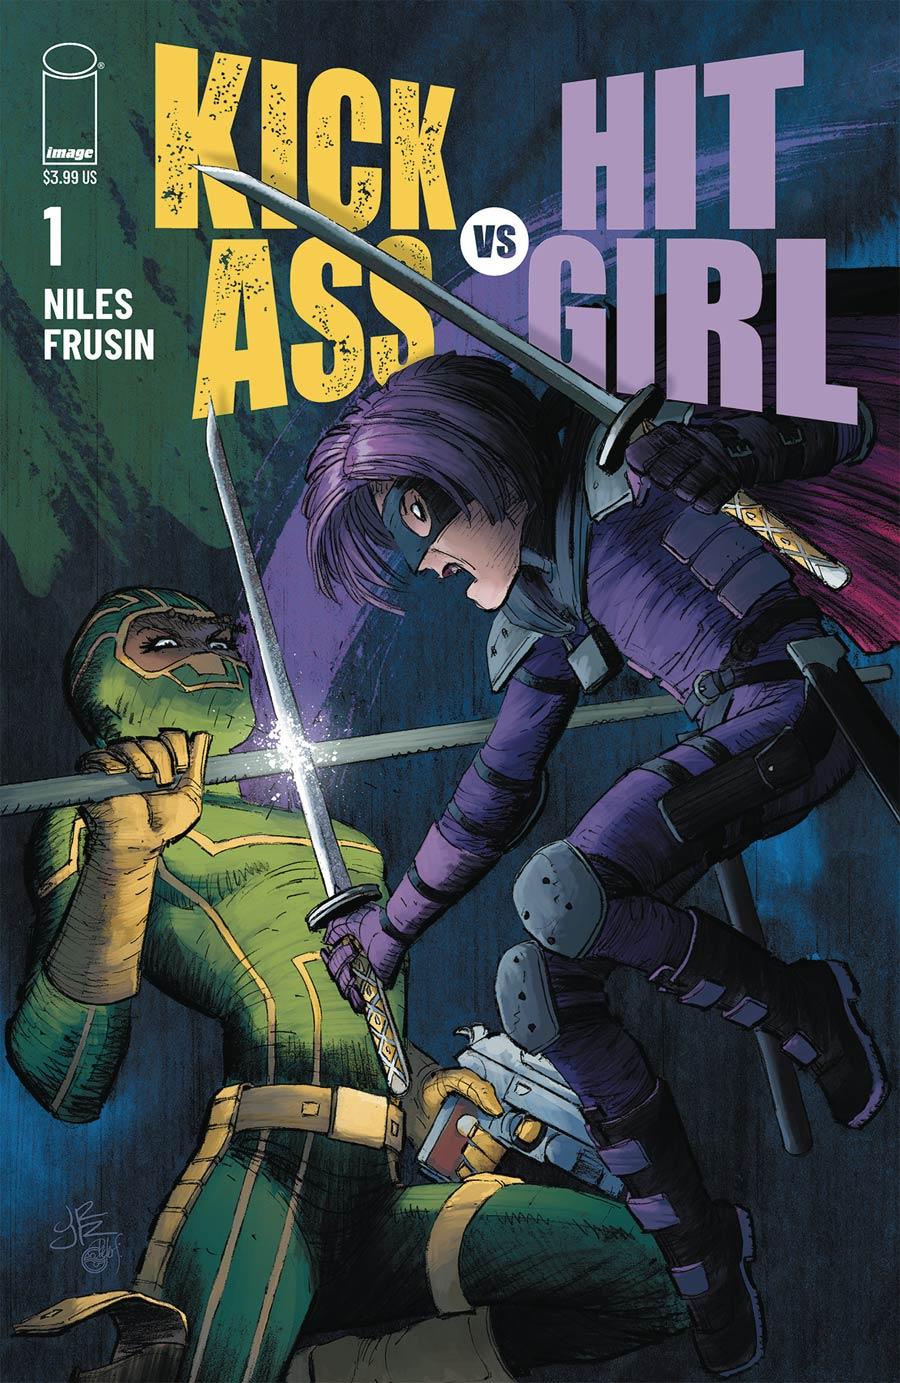 Kick-Ass vs Hit-Girl #1 Cover A Regular John Romita Jr Color Cover